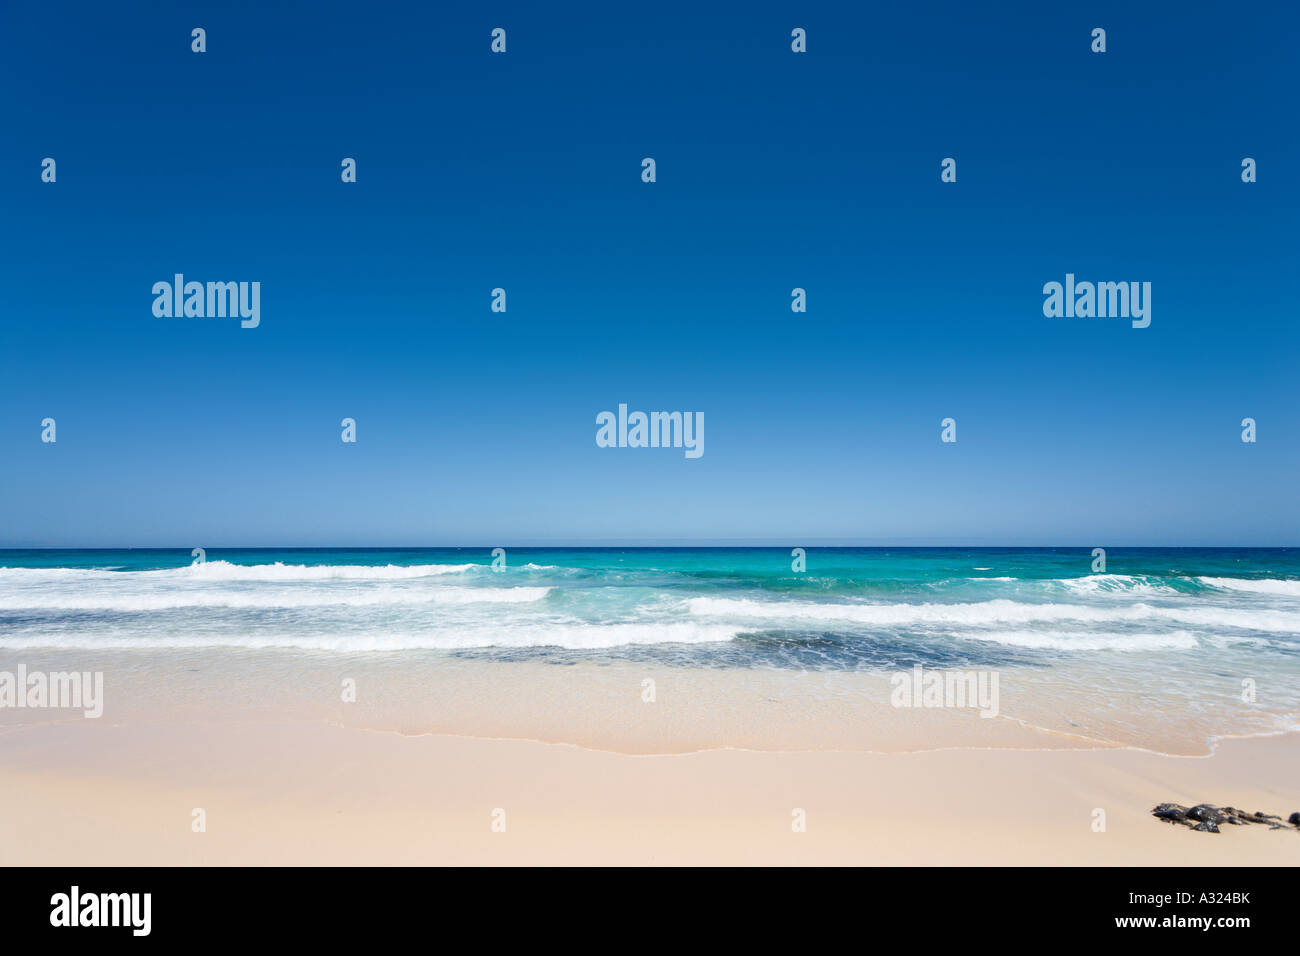 Strand in den Parque Natural de Corralejo, Fuerteventura, Kanarische Inseln, Spanien Stockbild